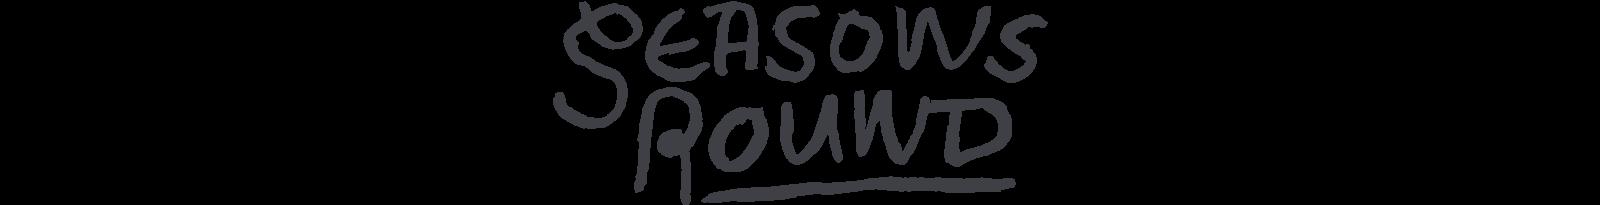 Seasons Round